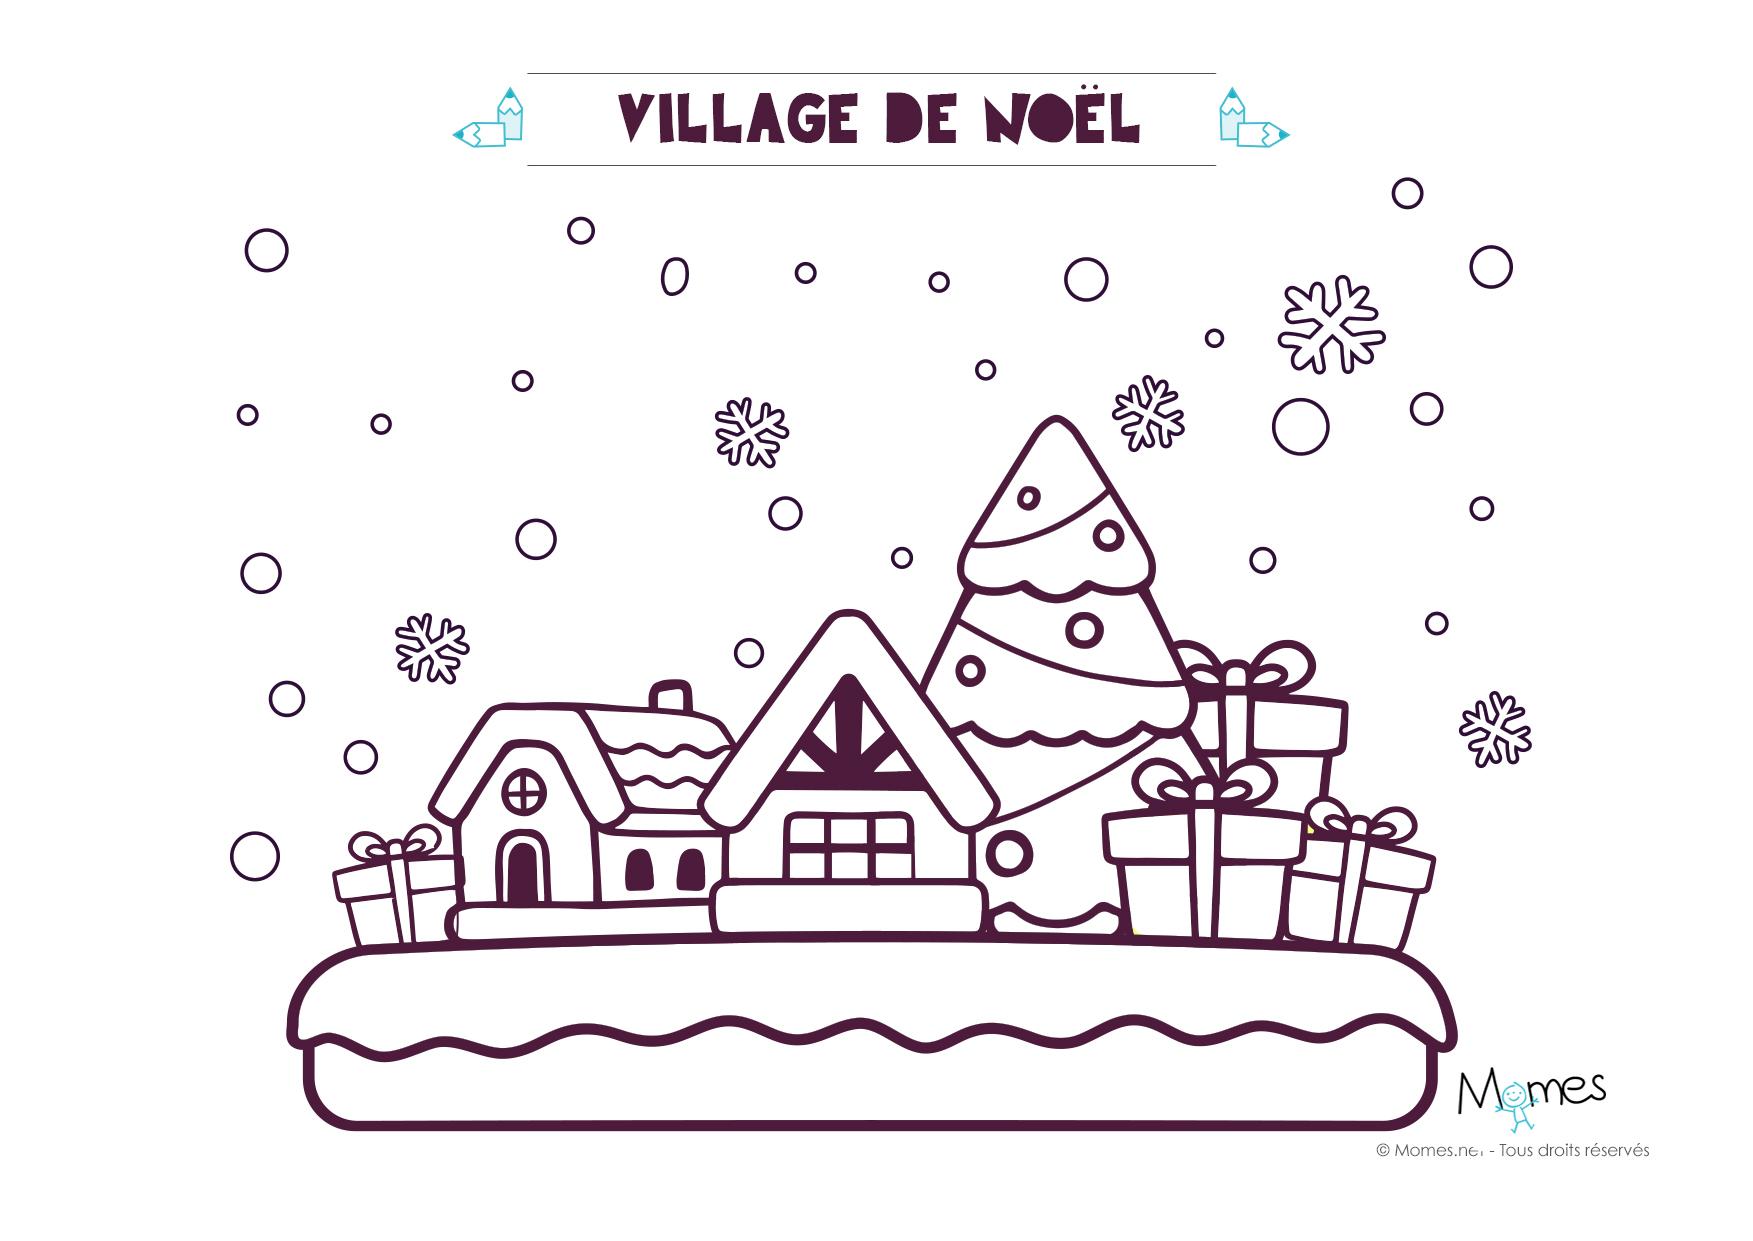 Coloriage de no l le village - Les dessin de noel ...